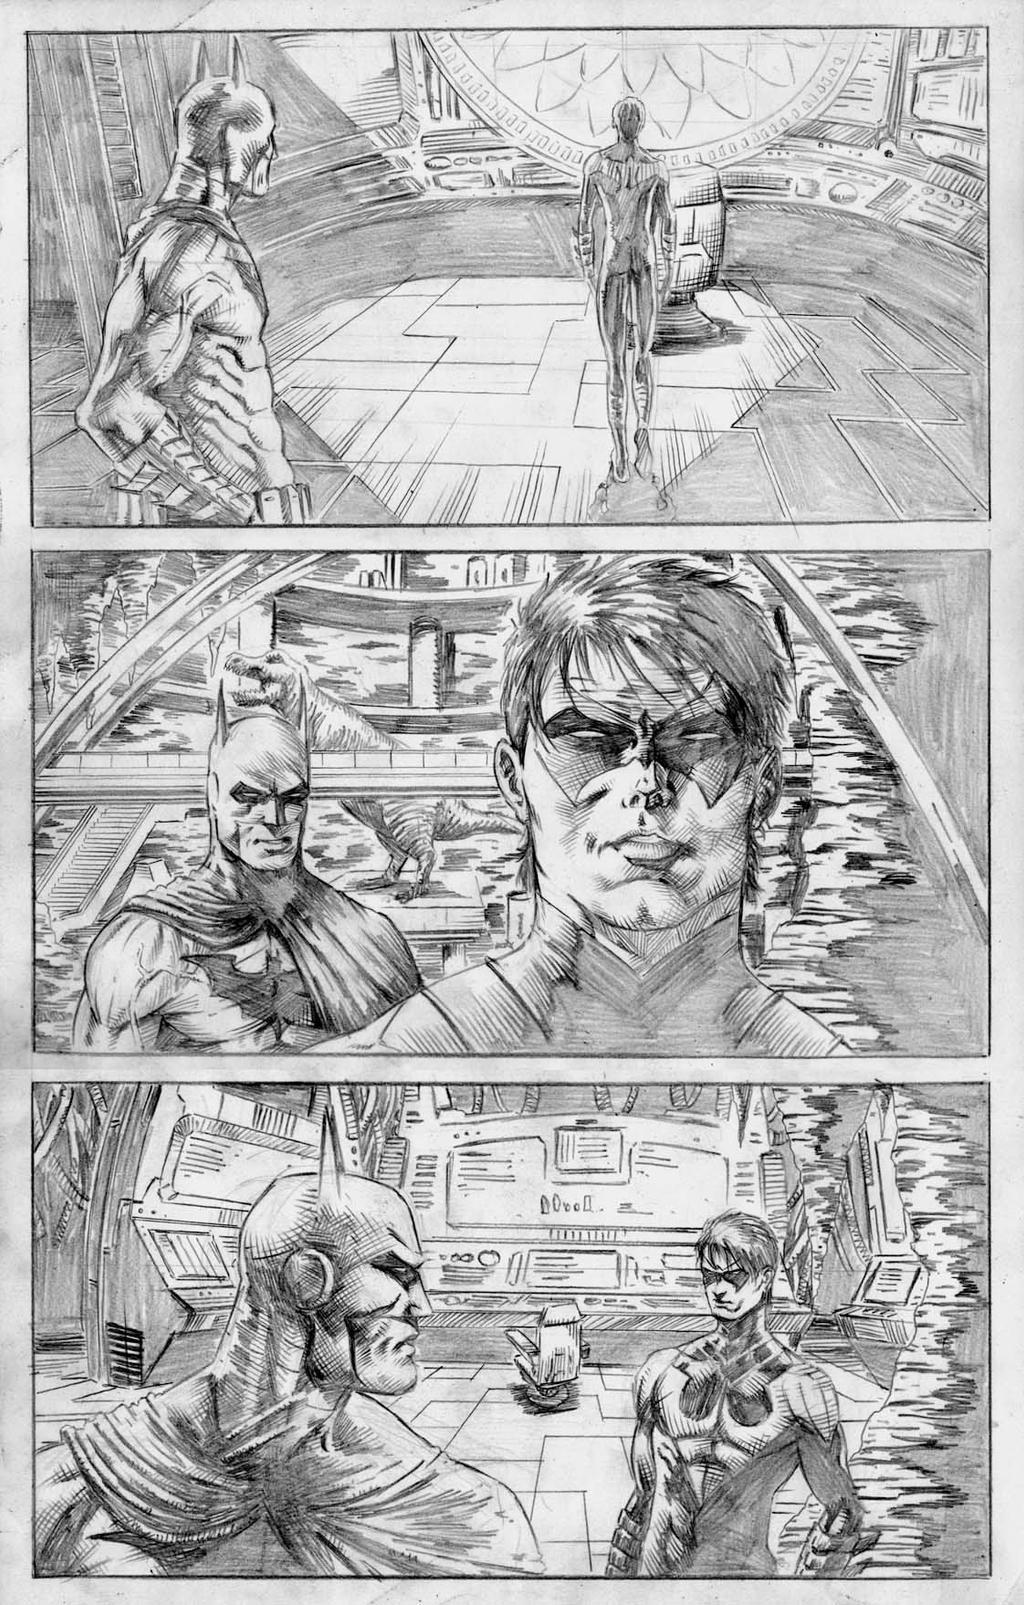 SanEspina Batman Issue2 page10 by santiagocomics